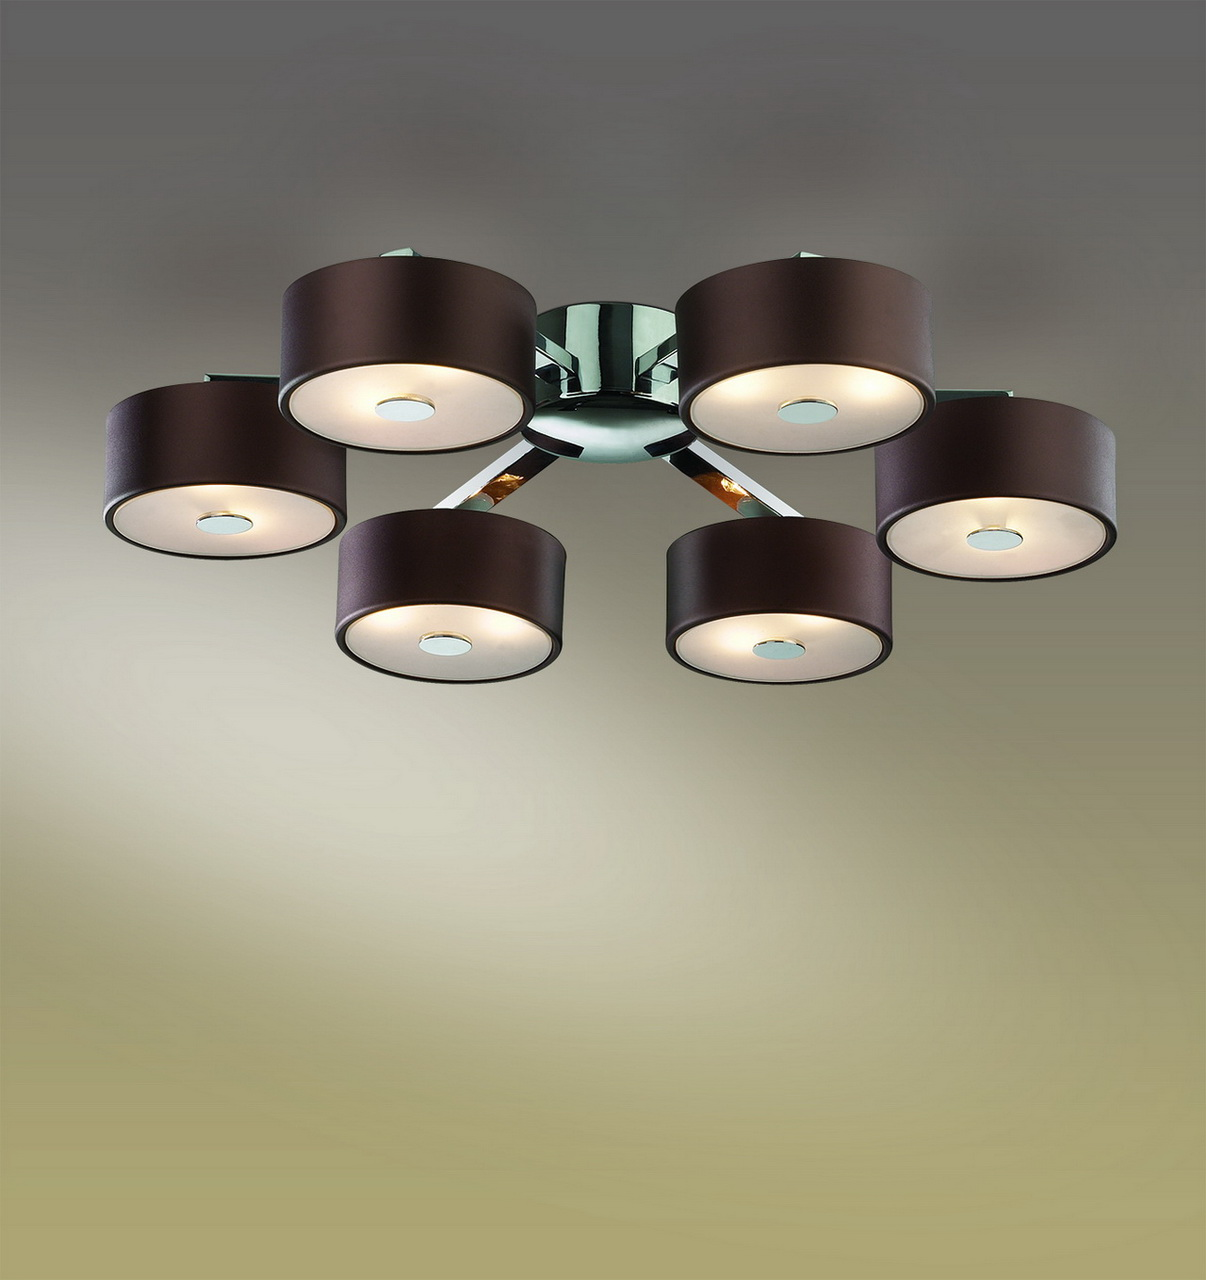 Потолочная люстра Odeon Light Salar 2047/12C потолочная люстра odeon light domeka 2706 8cl